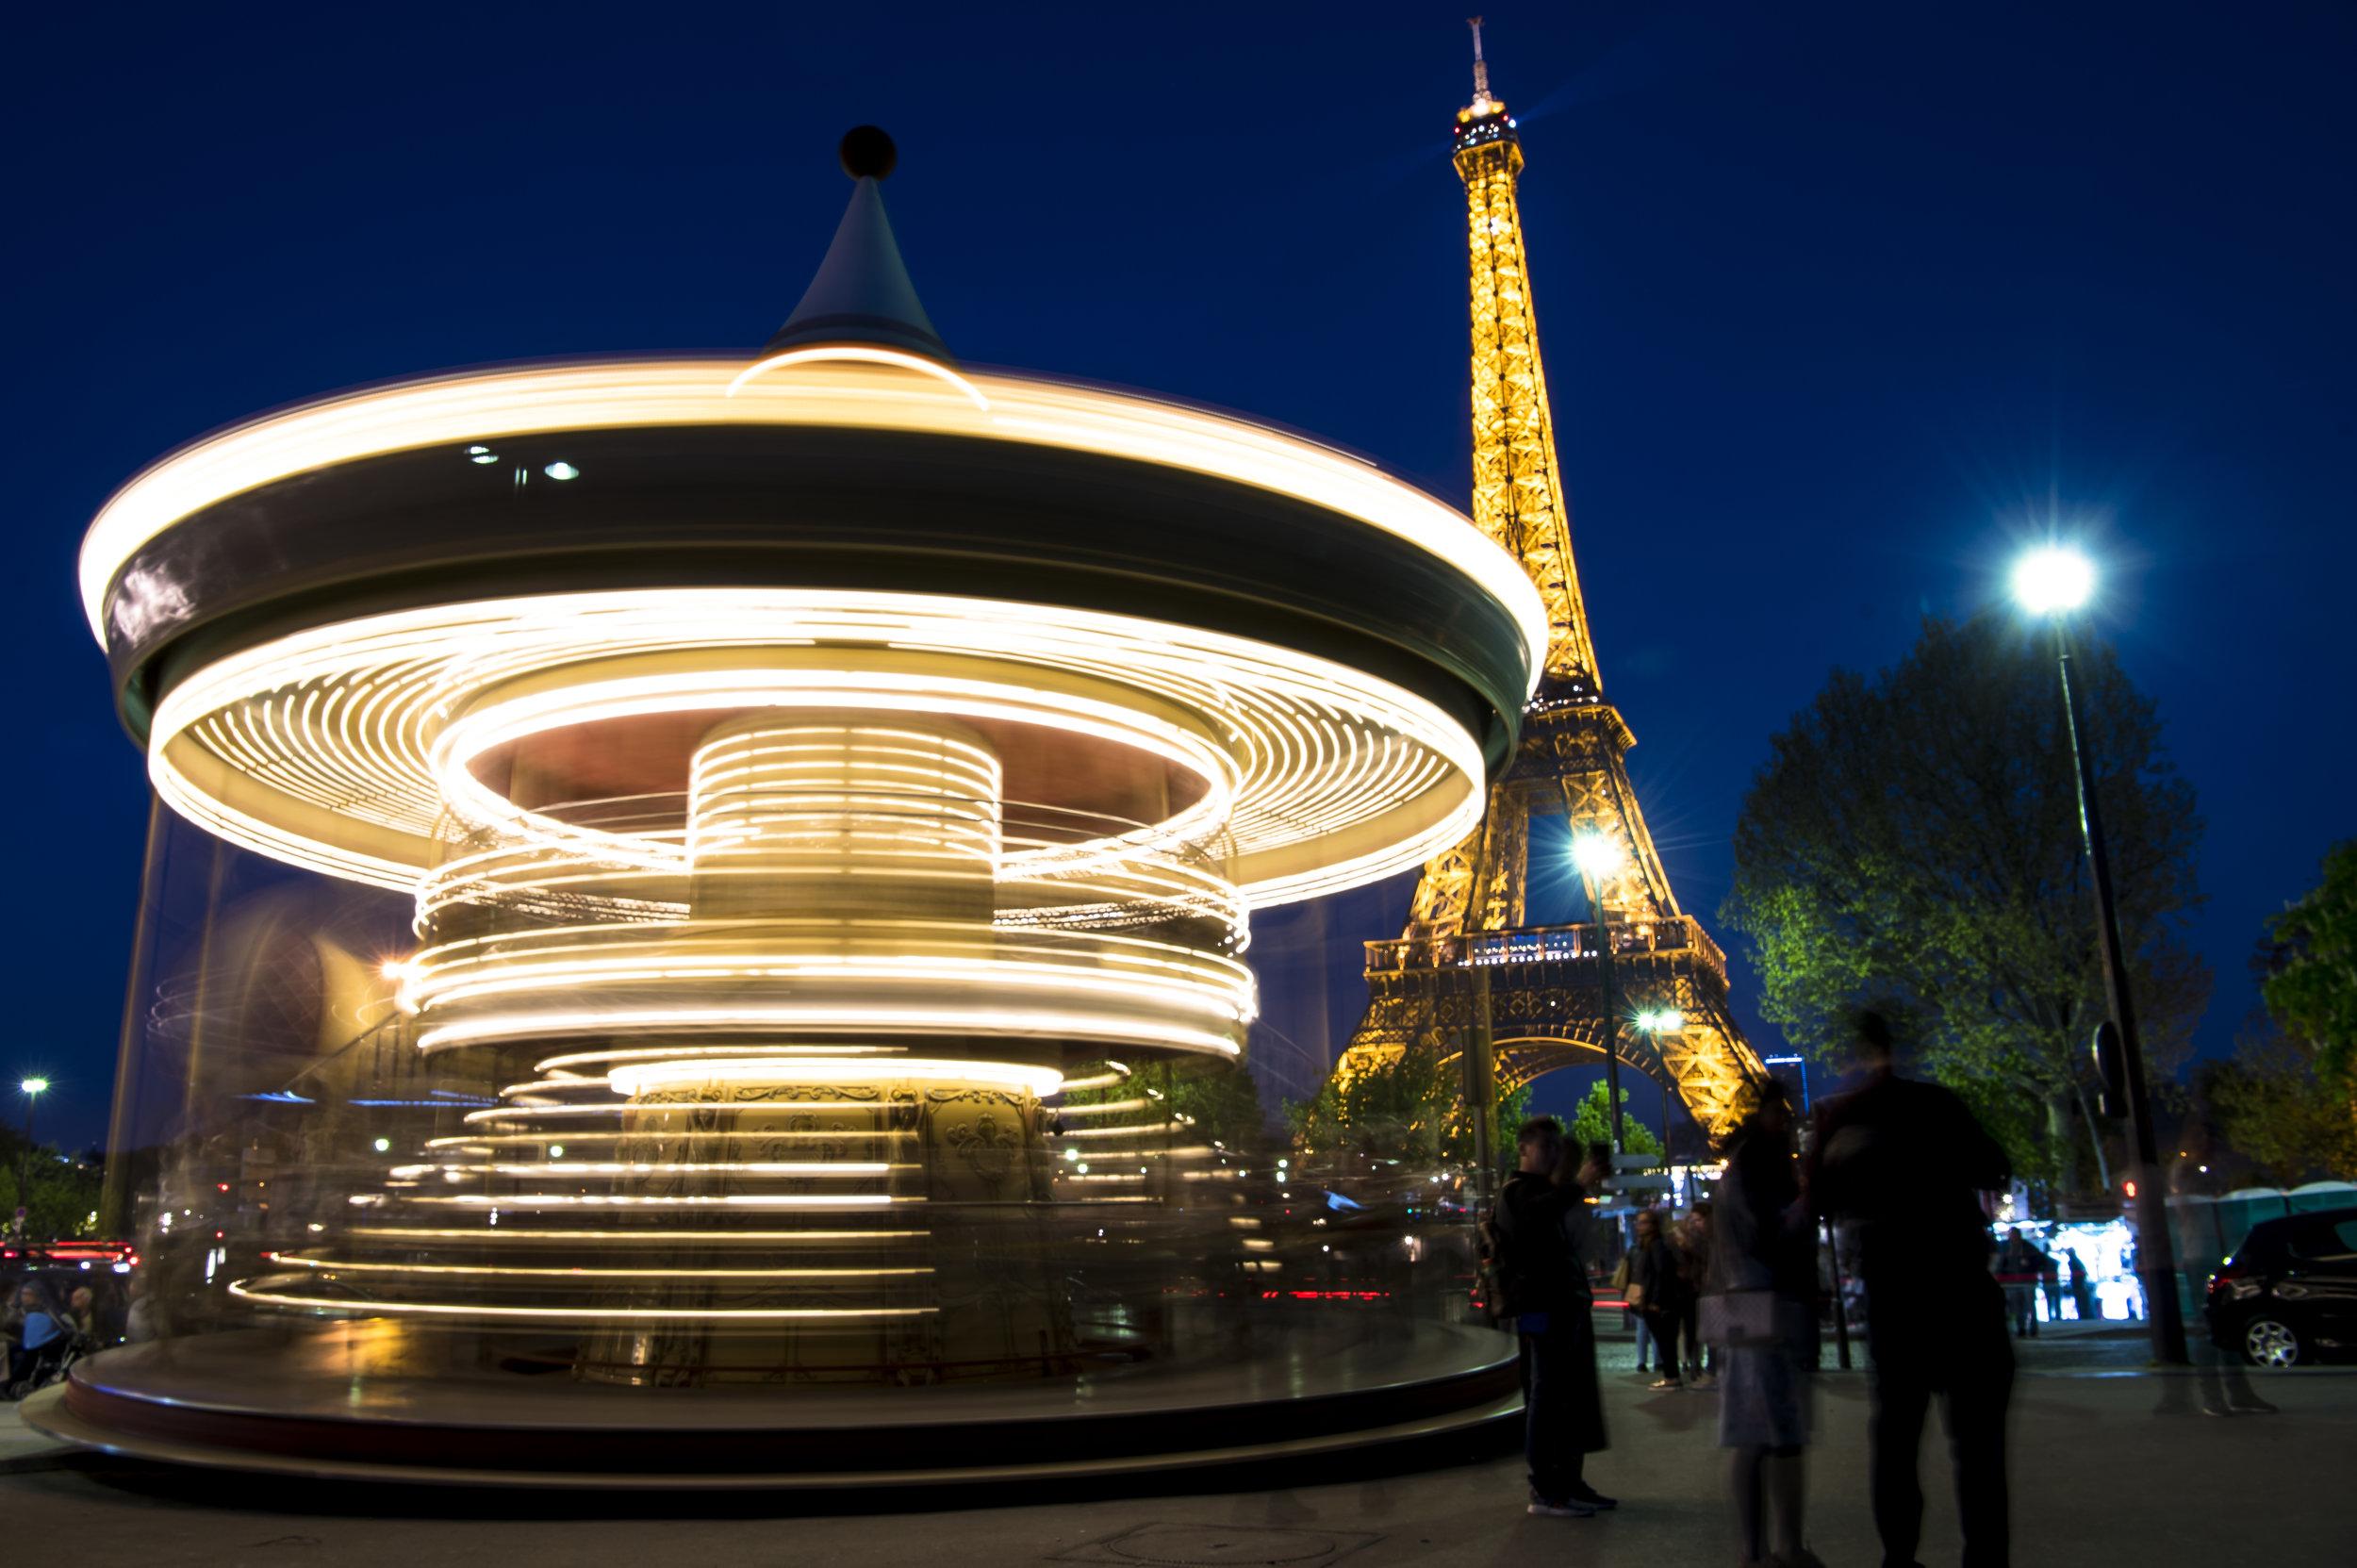 Parisian Carousel  (Paris, France)